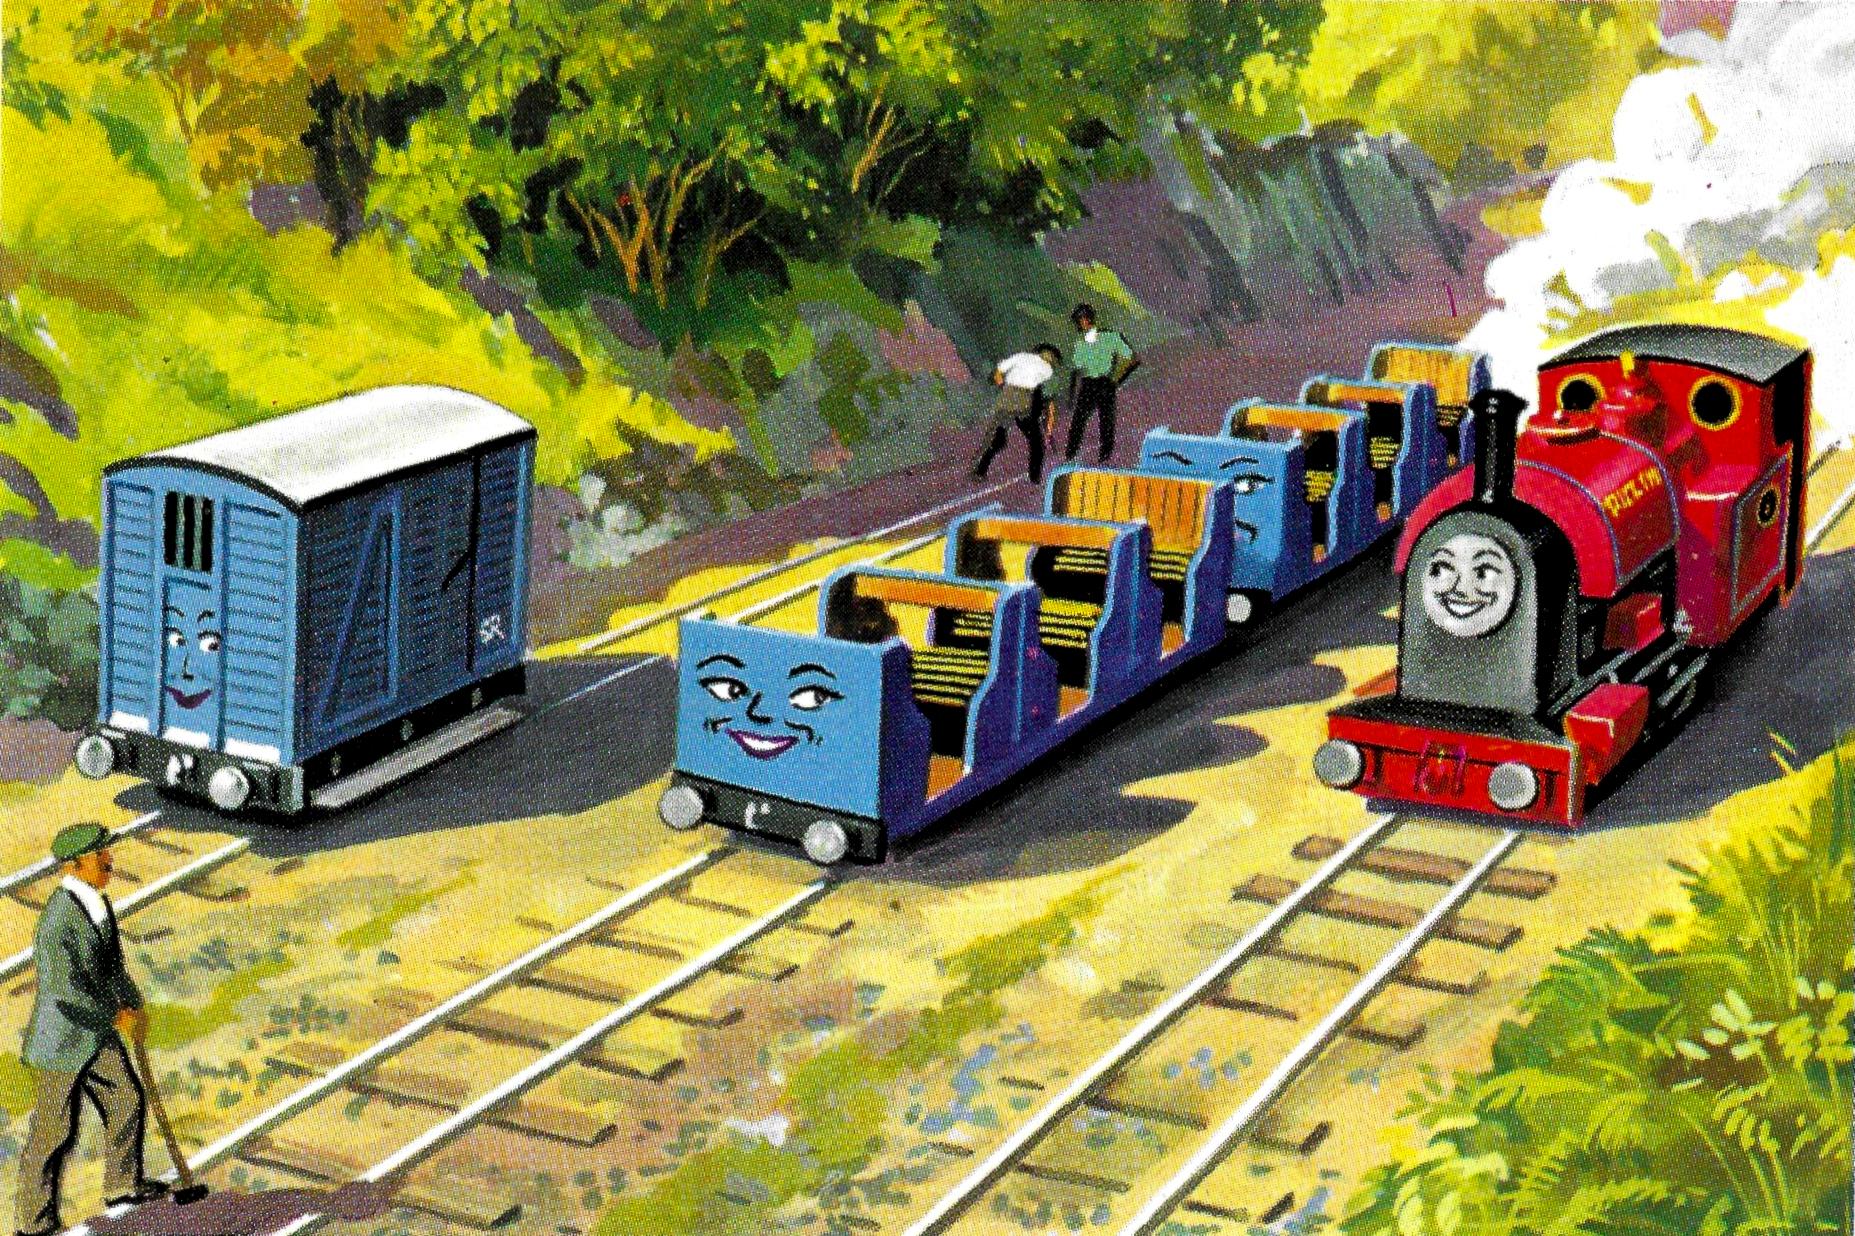 Ada Jane And Mabelgallery Thomas The Tank Engine Wikia Fandom